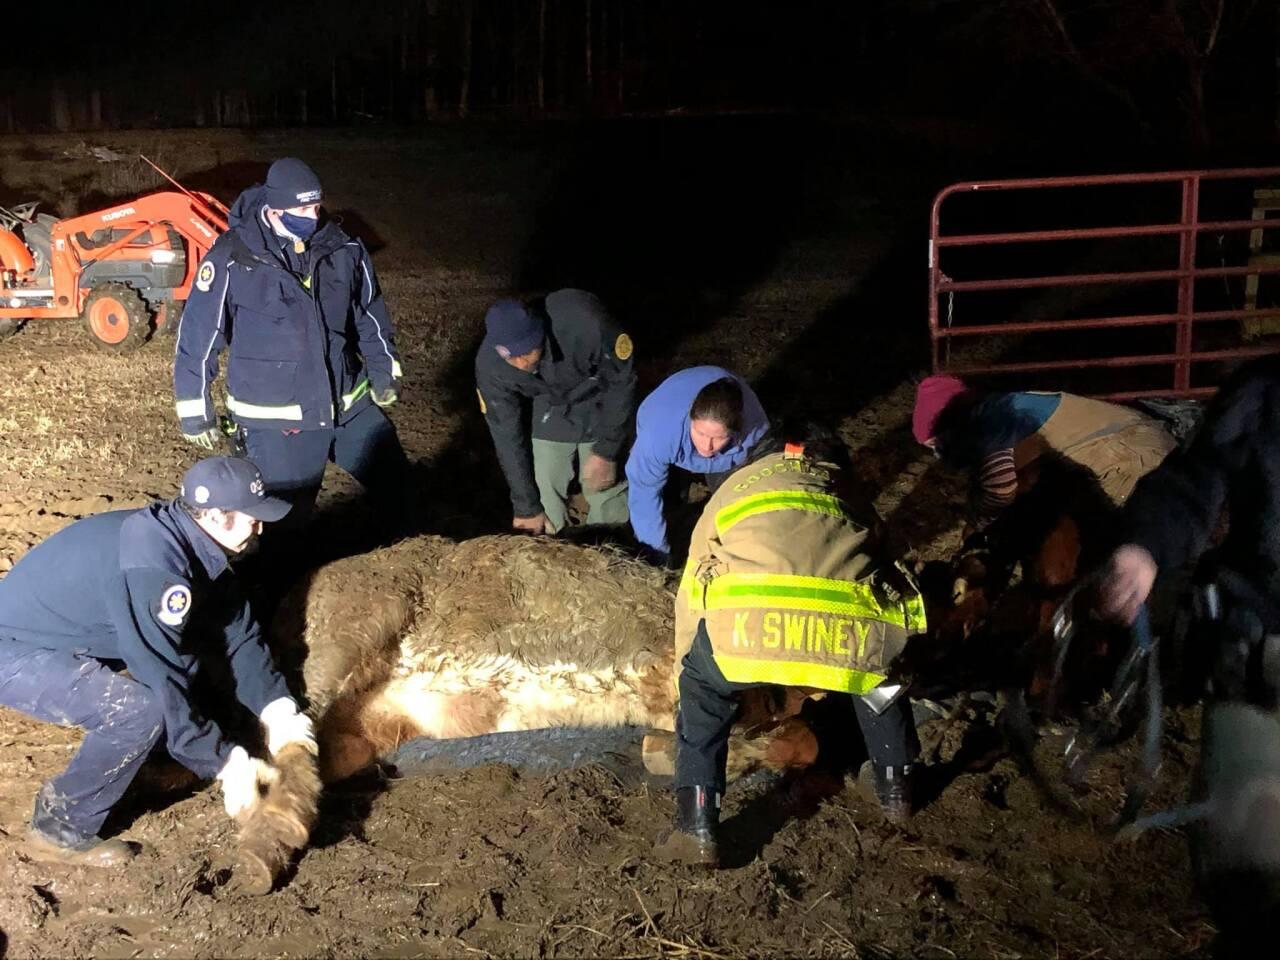 Goochland Horse Stuck in Mud 3.jpg